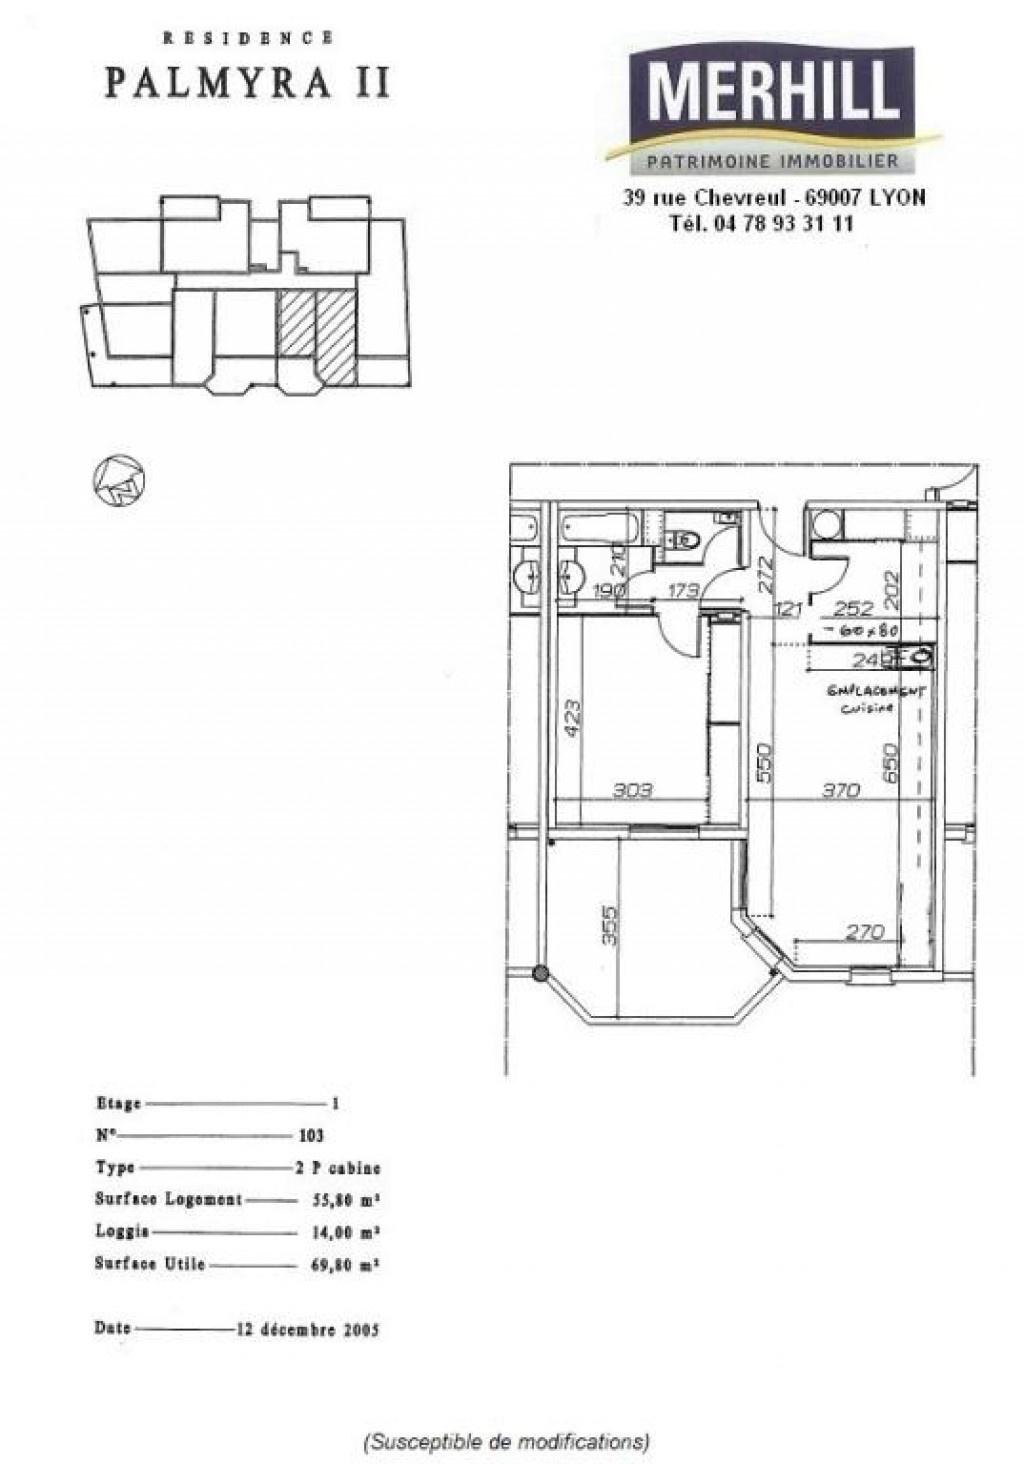 Palmyra II - Plan - Lot 103